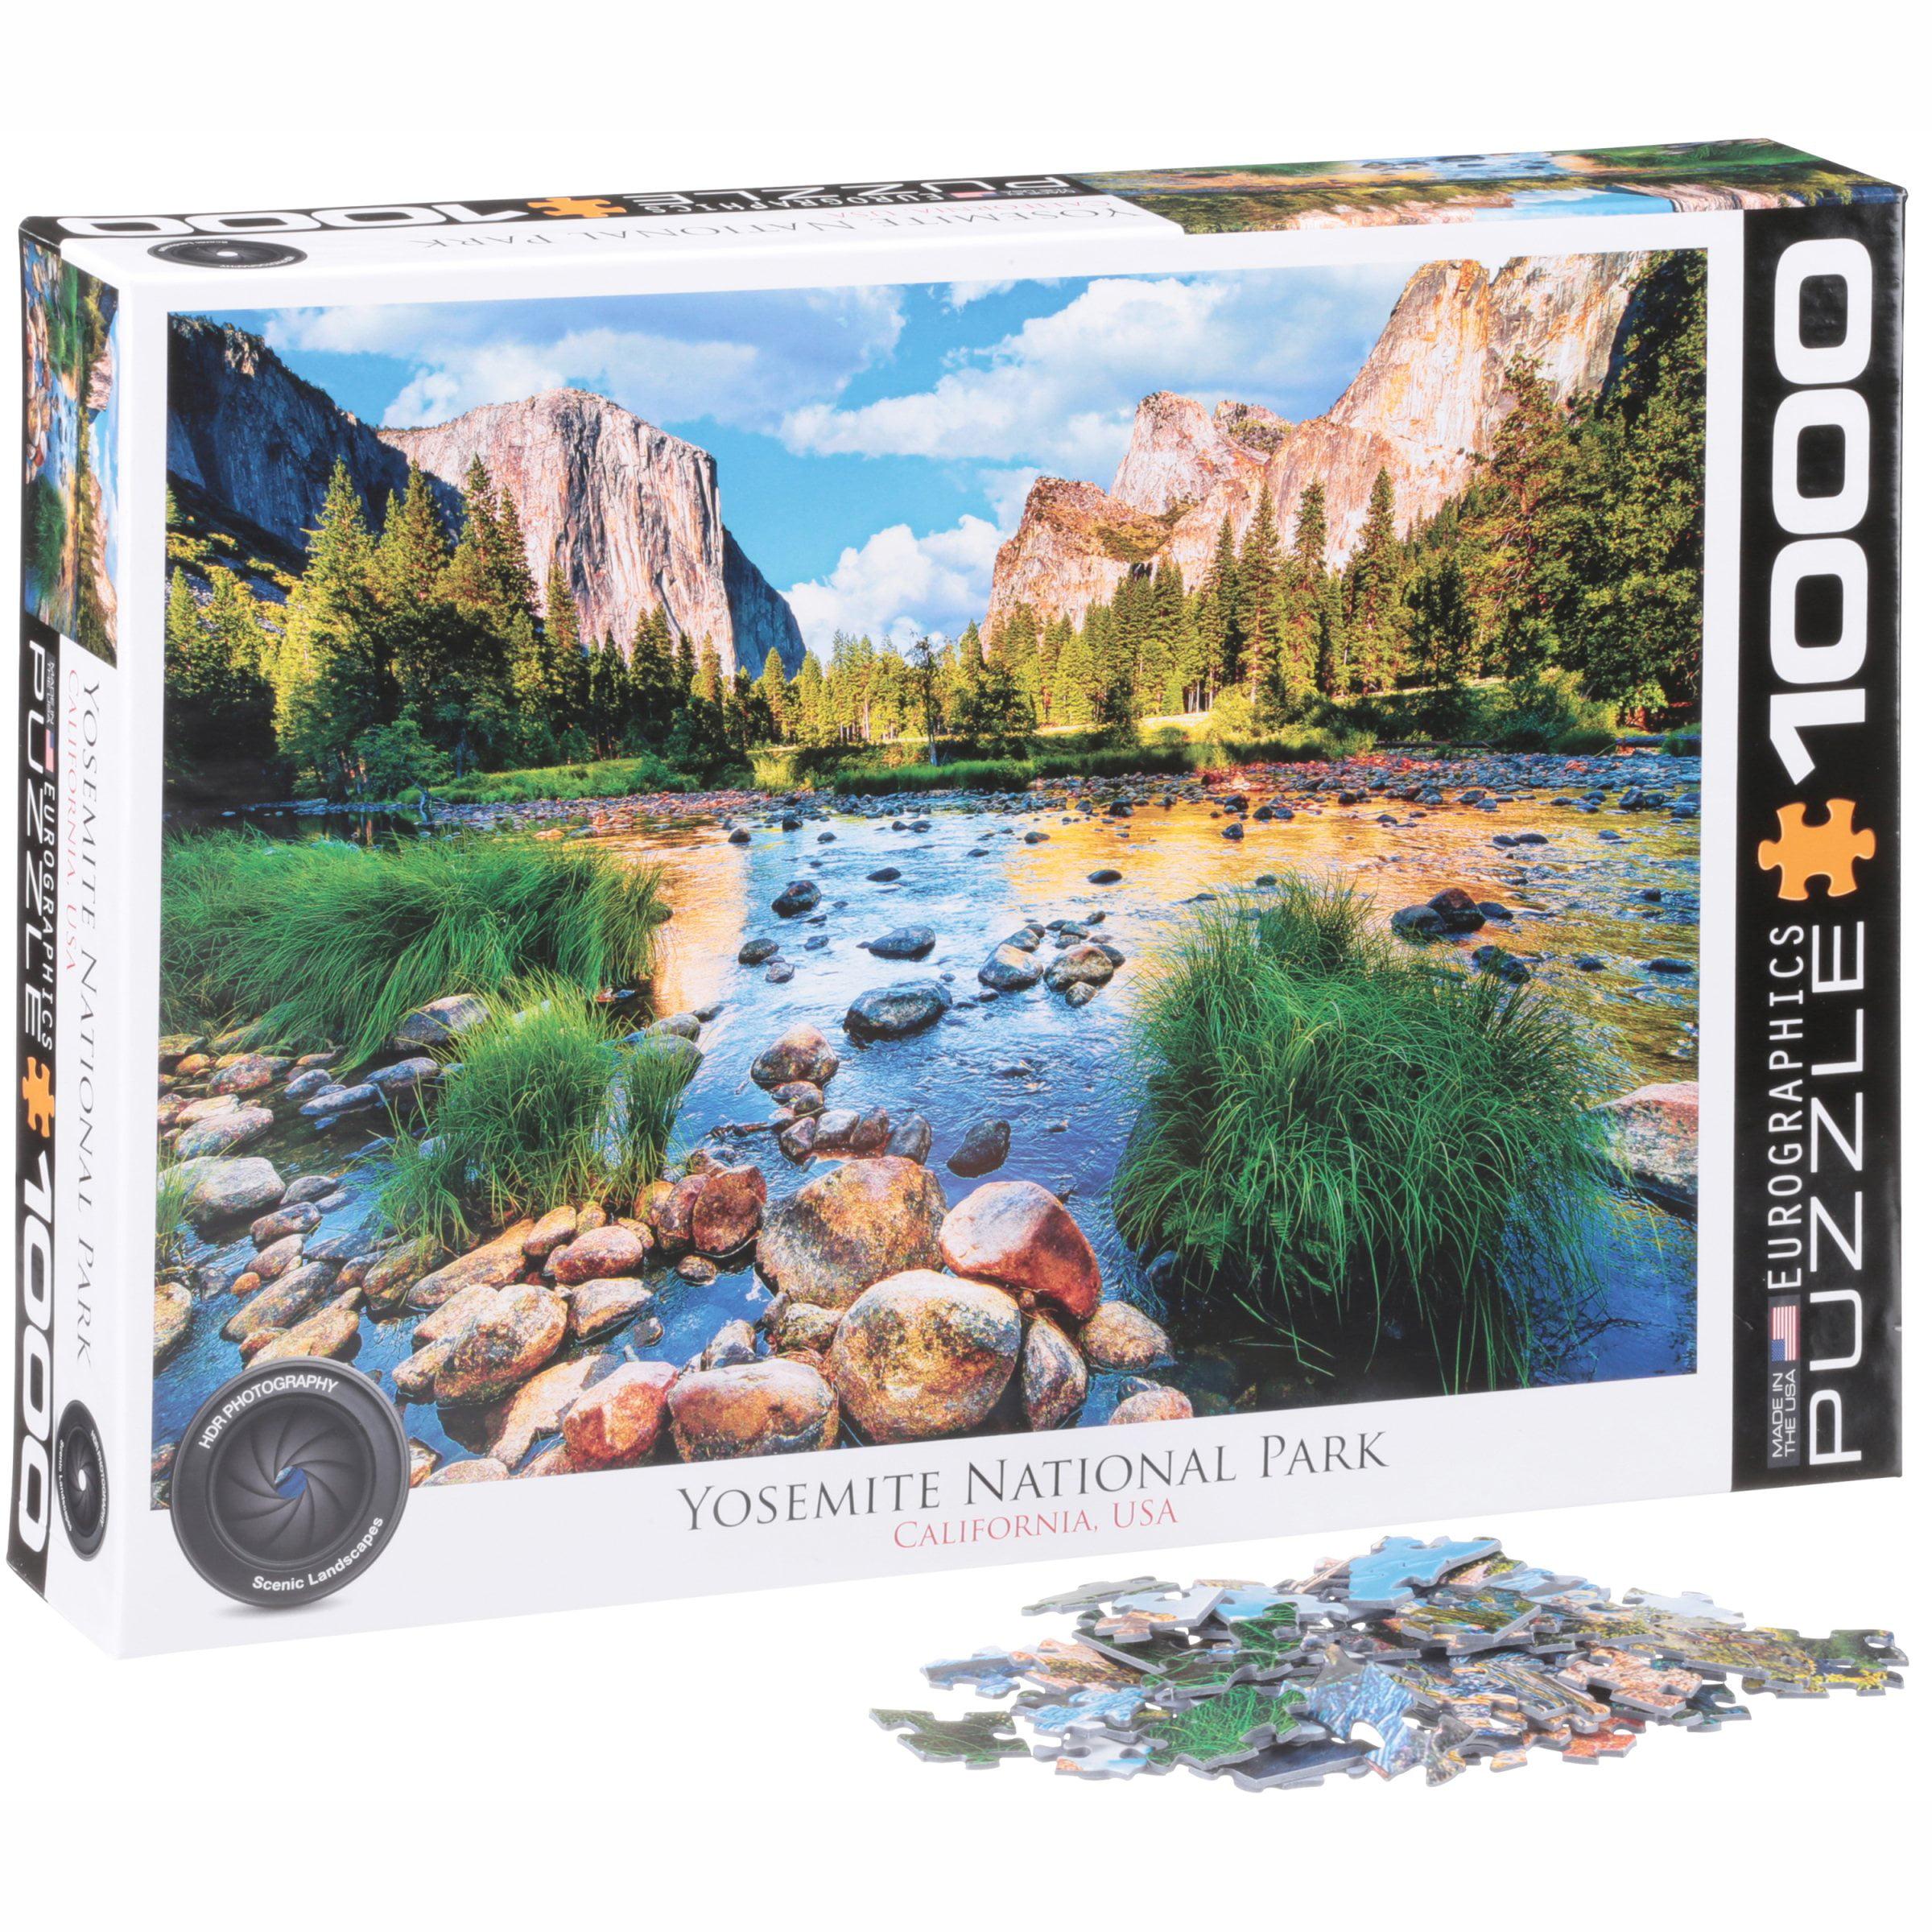 Eurographics Yosemite National Park 1000 Piece Puzzle by EuroGraphics